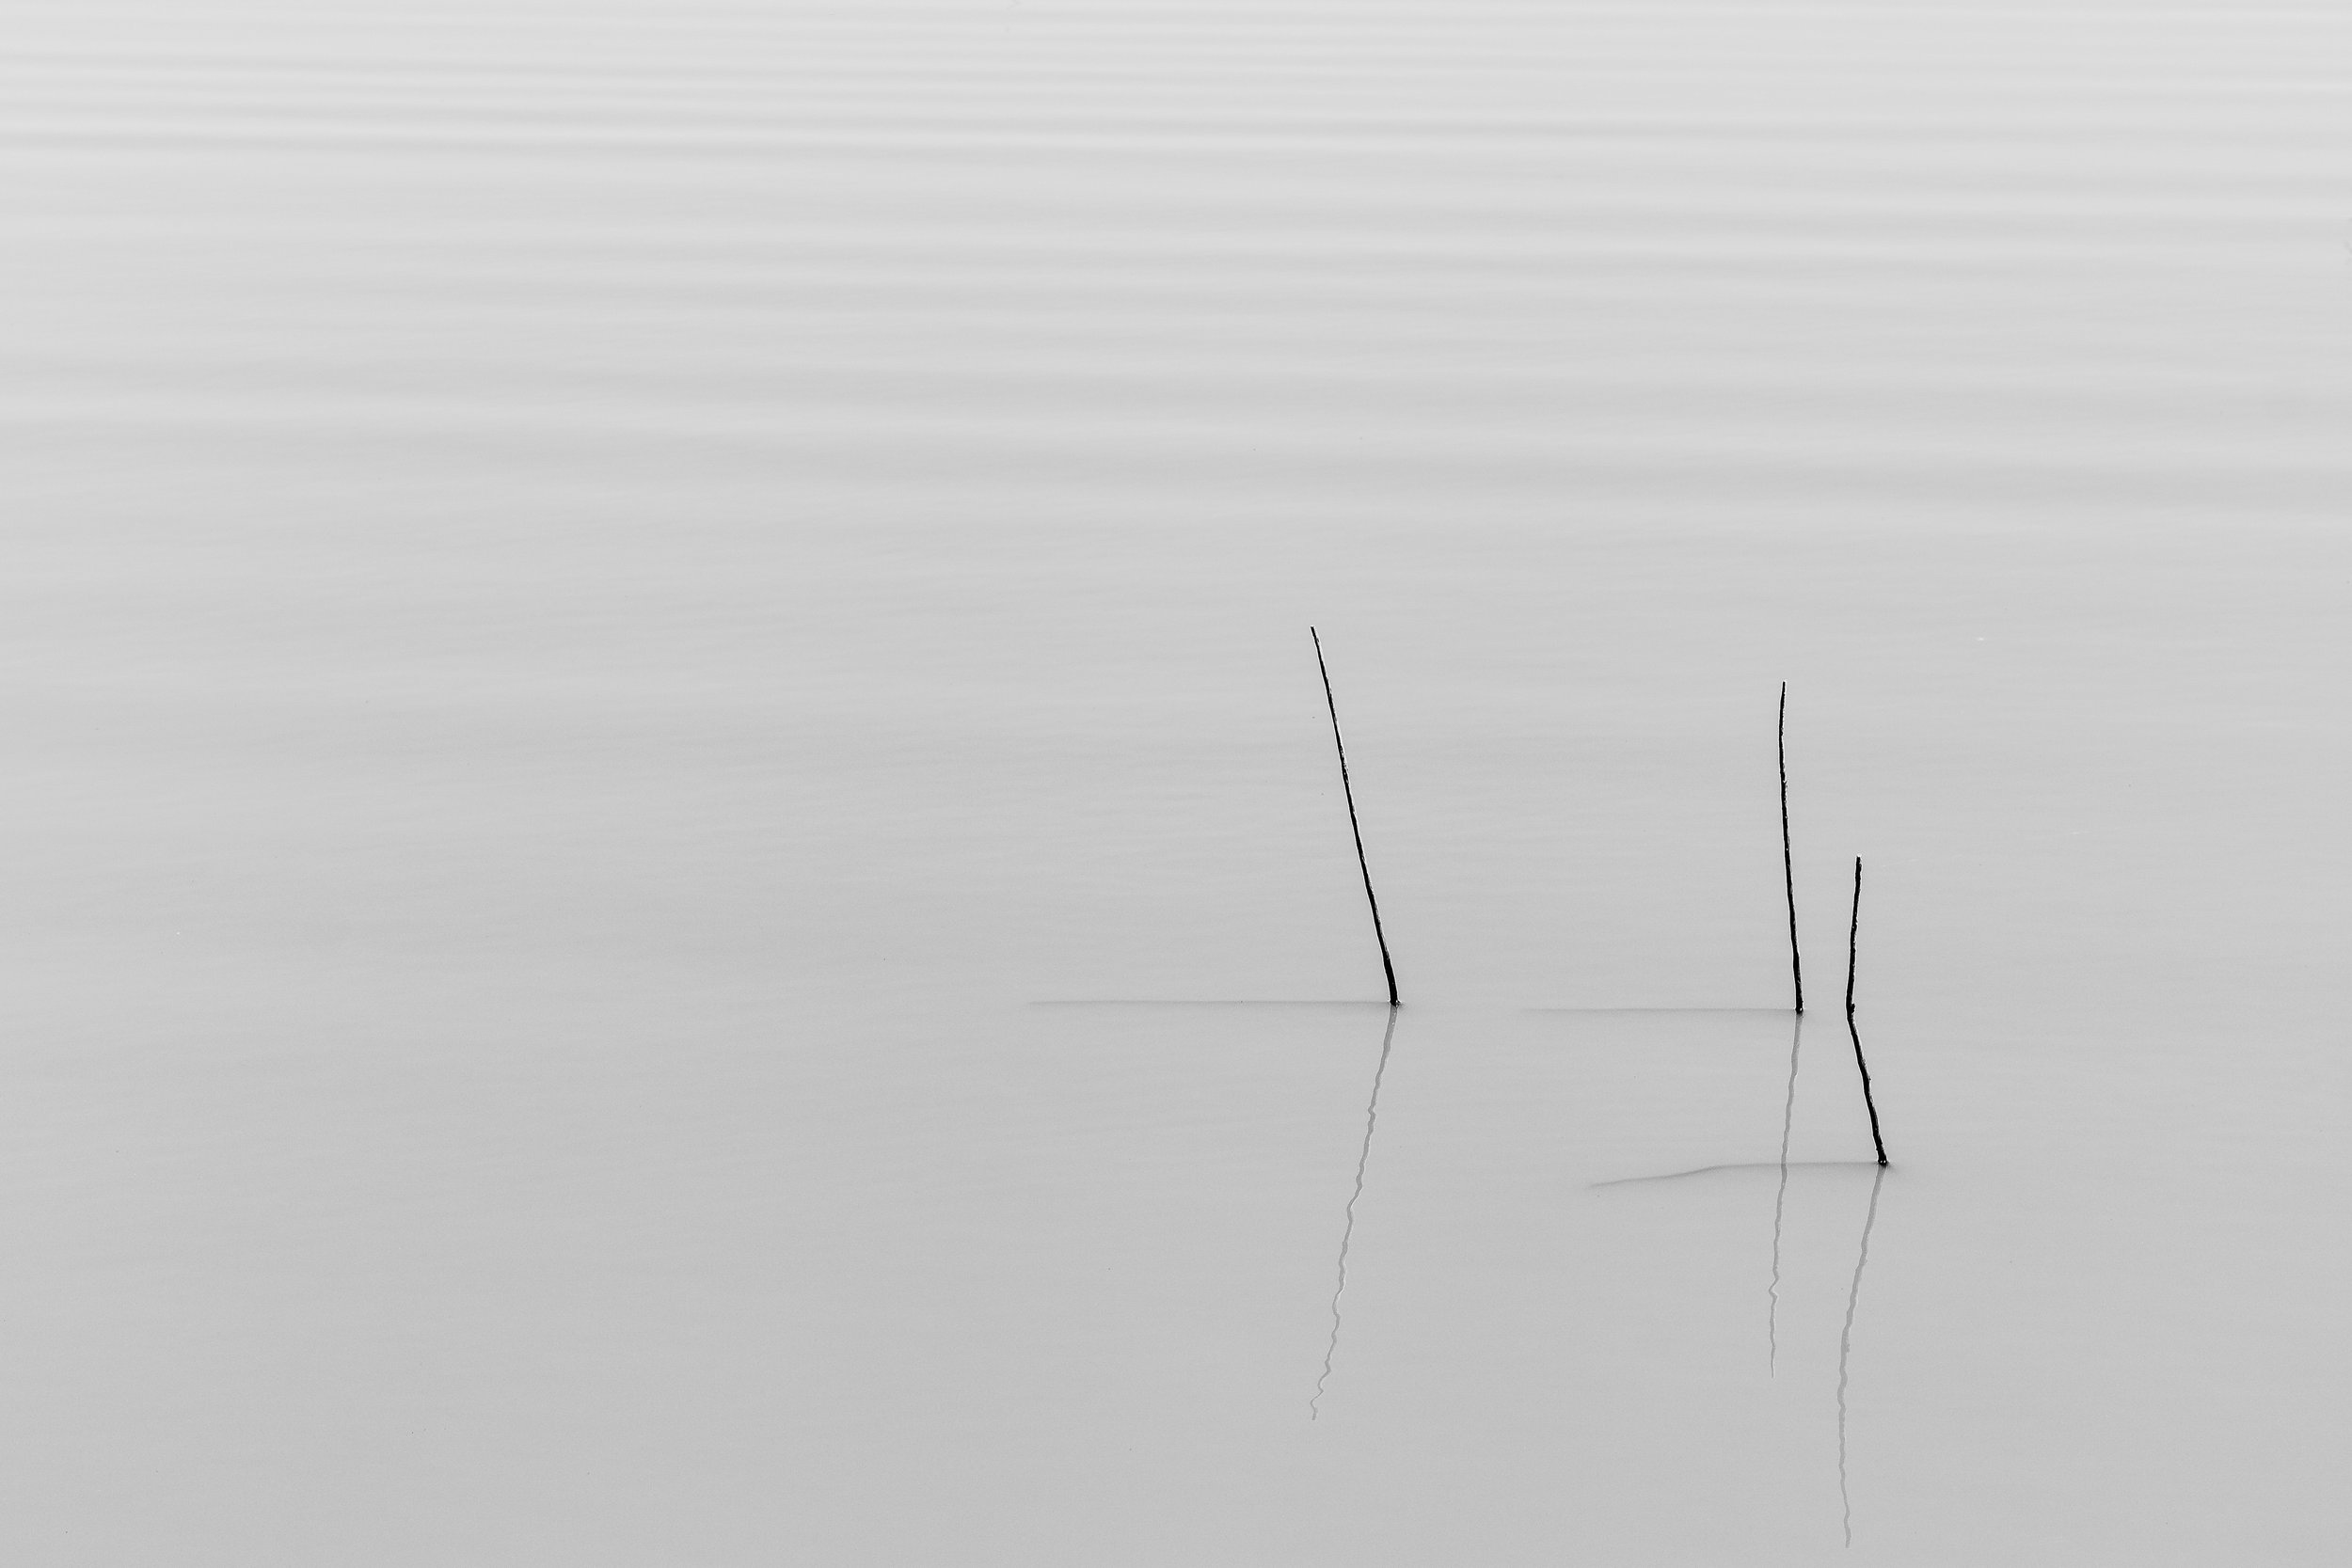 Lake Black and White Zen Minamilism Silence Quiet Wallpaper by Ken Treloar Photography.jpg